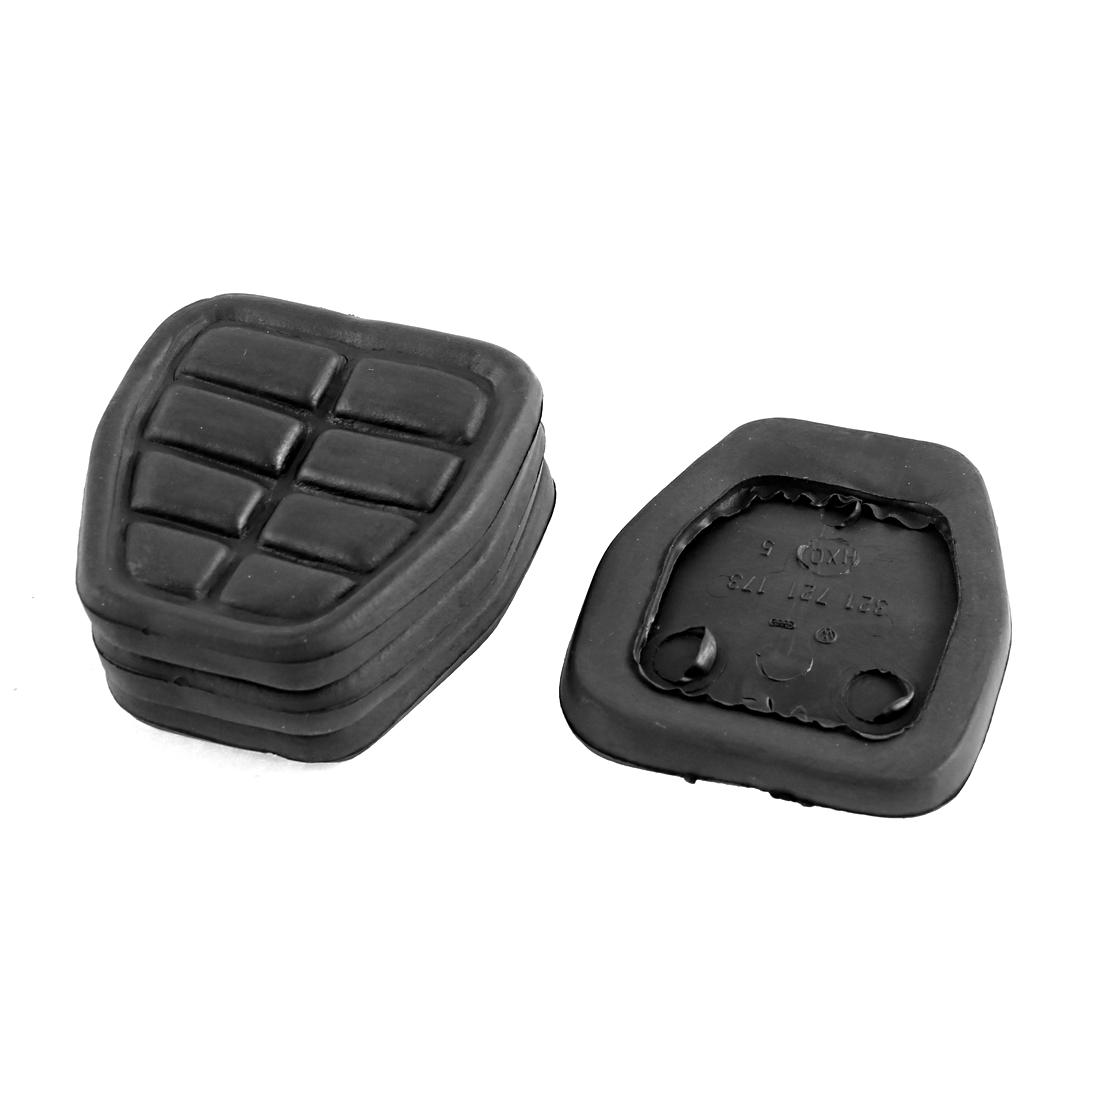 4pcs Black Rubber Car Auto Vehicle Antislip Brake Gas Clutch Pedal Pad Cover